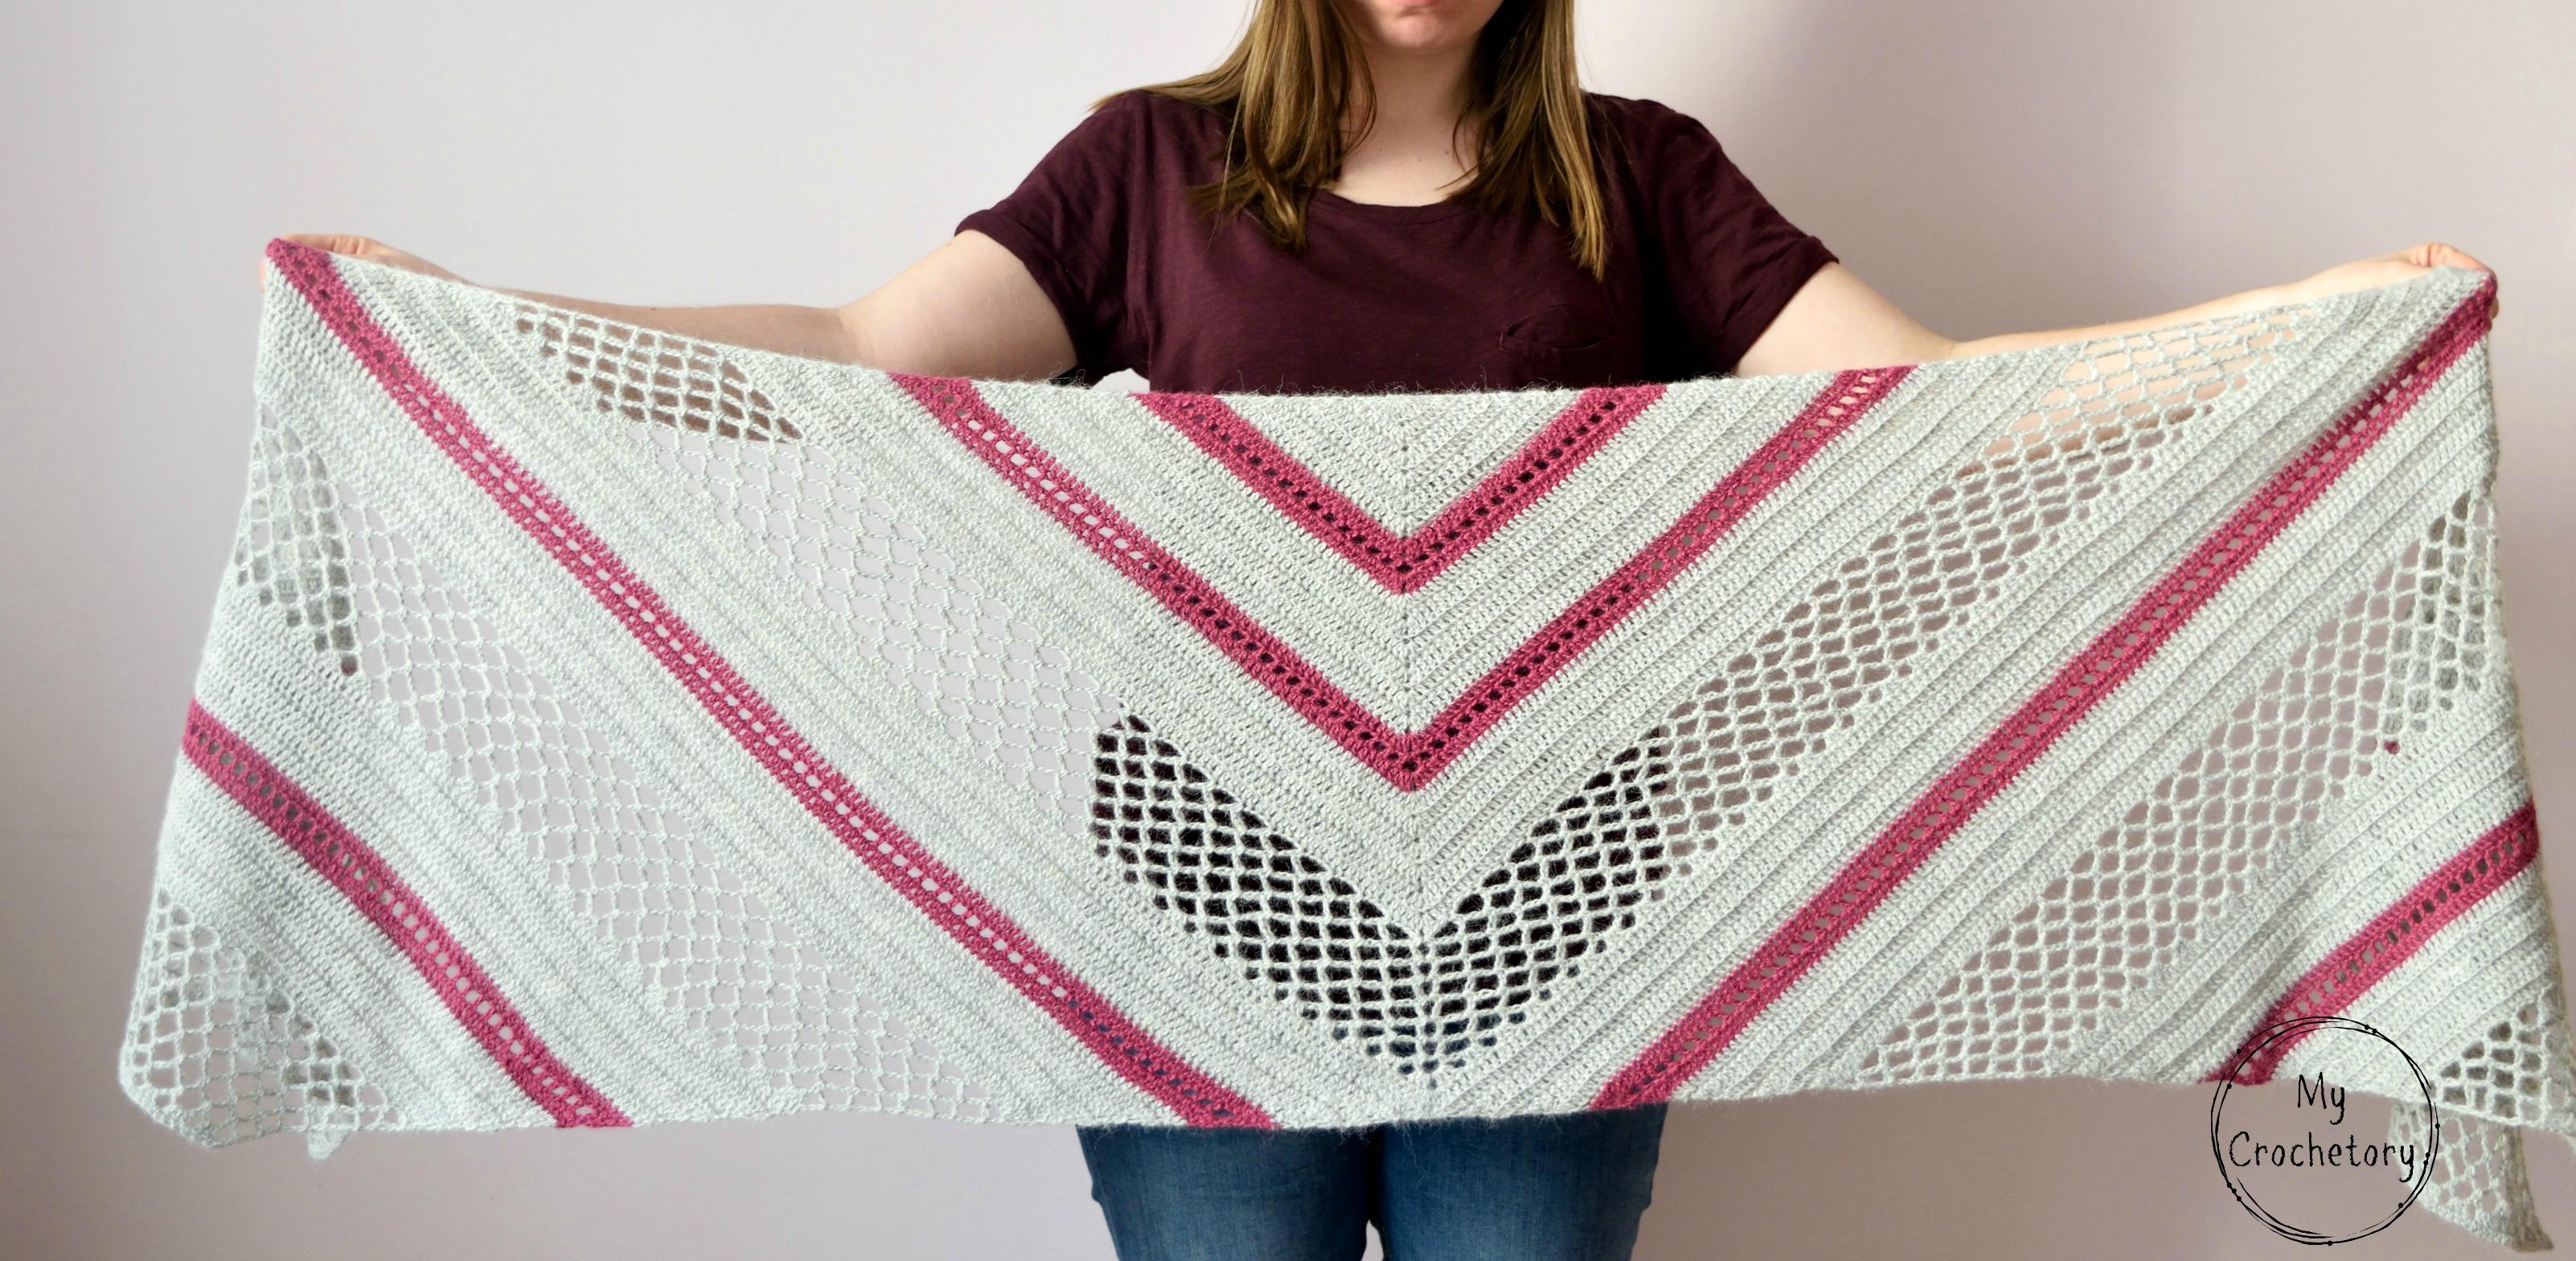 Spring Solstice Wrap Crochet Pattern Part 1 Mycrochetory Heart Shape Diagram